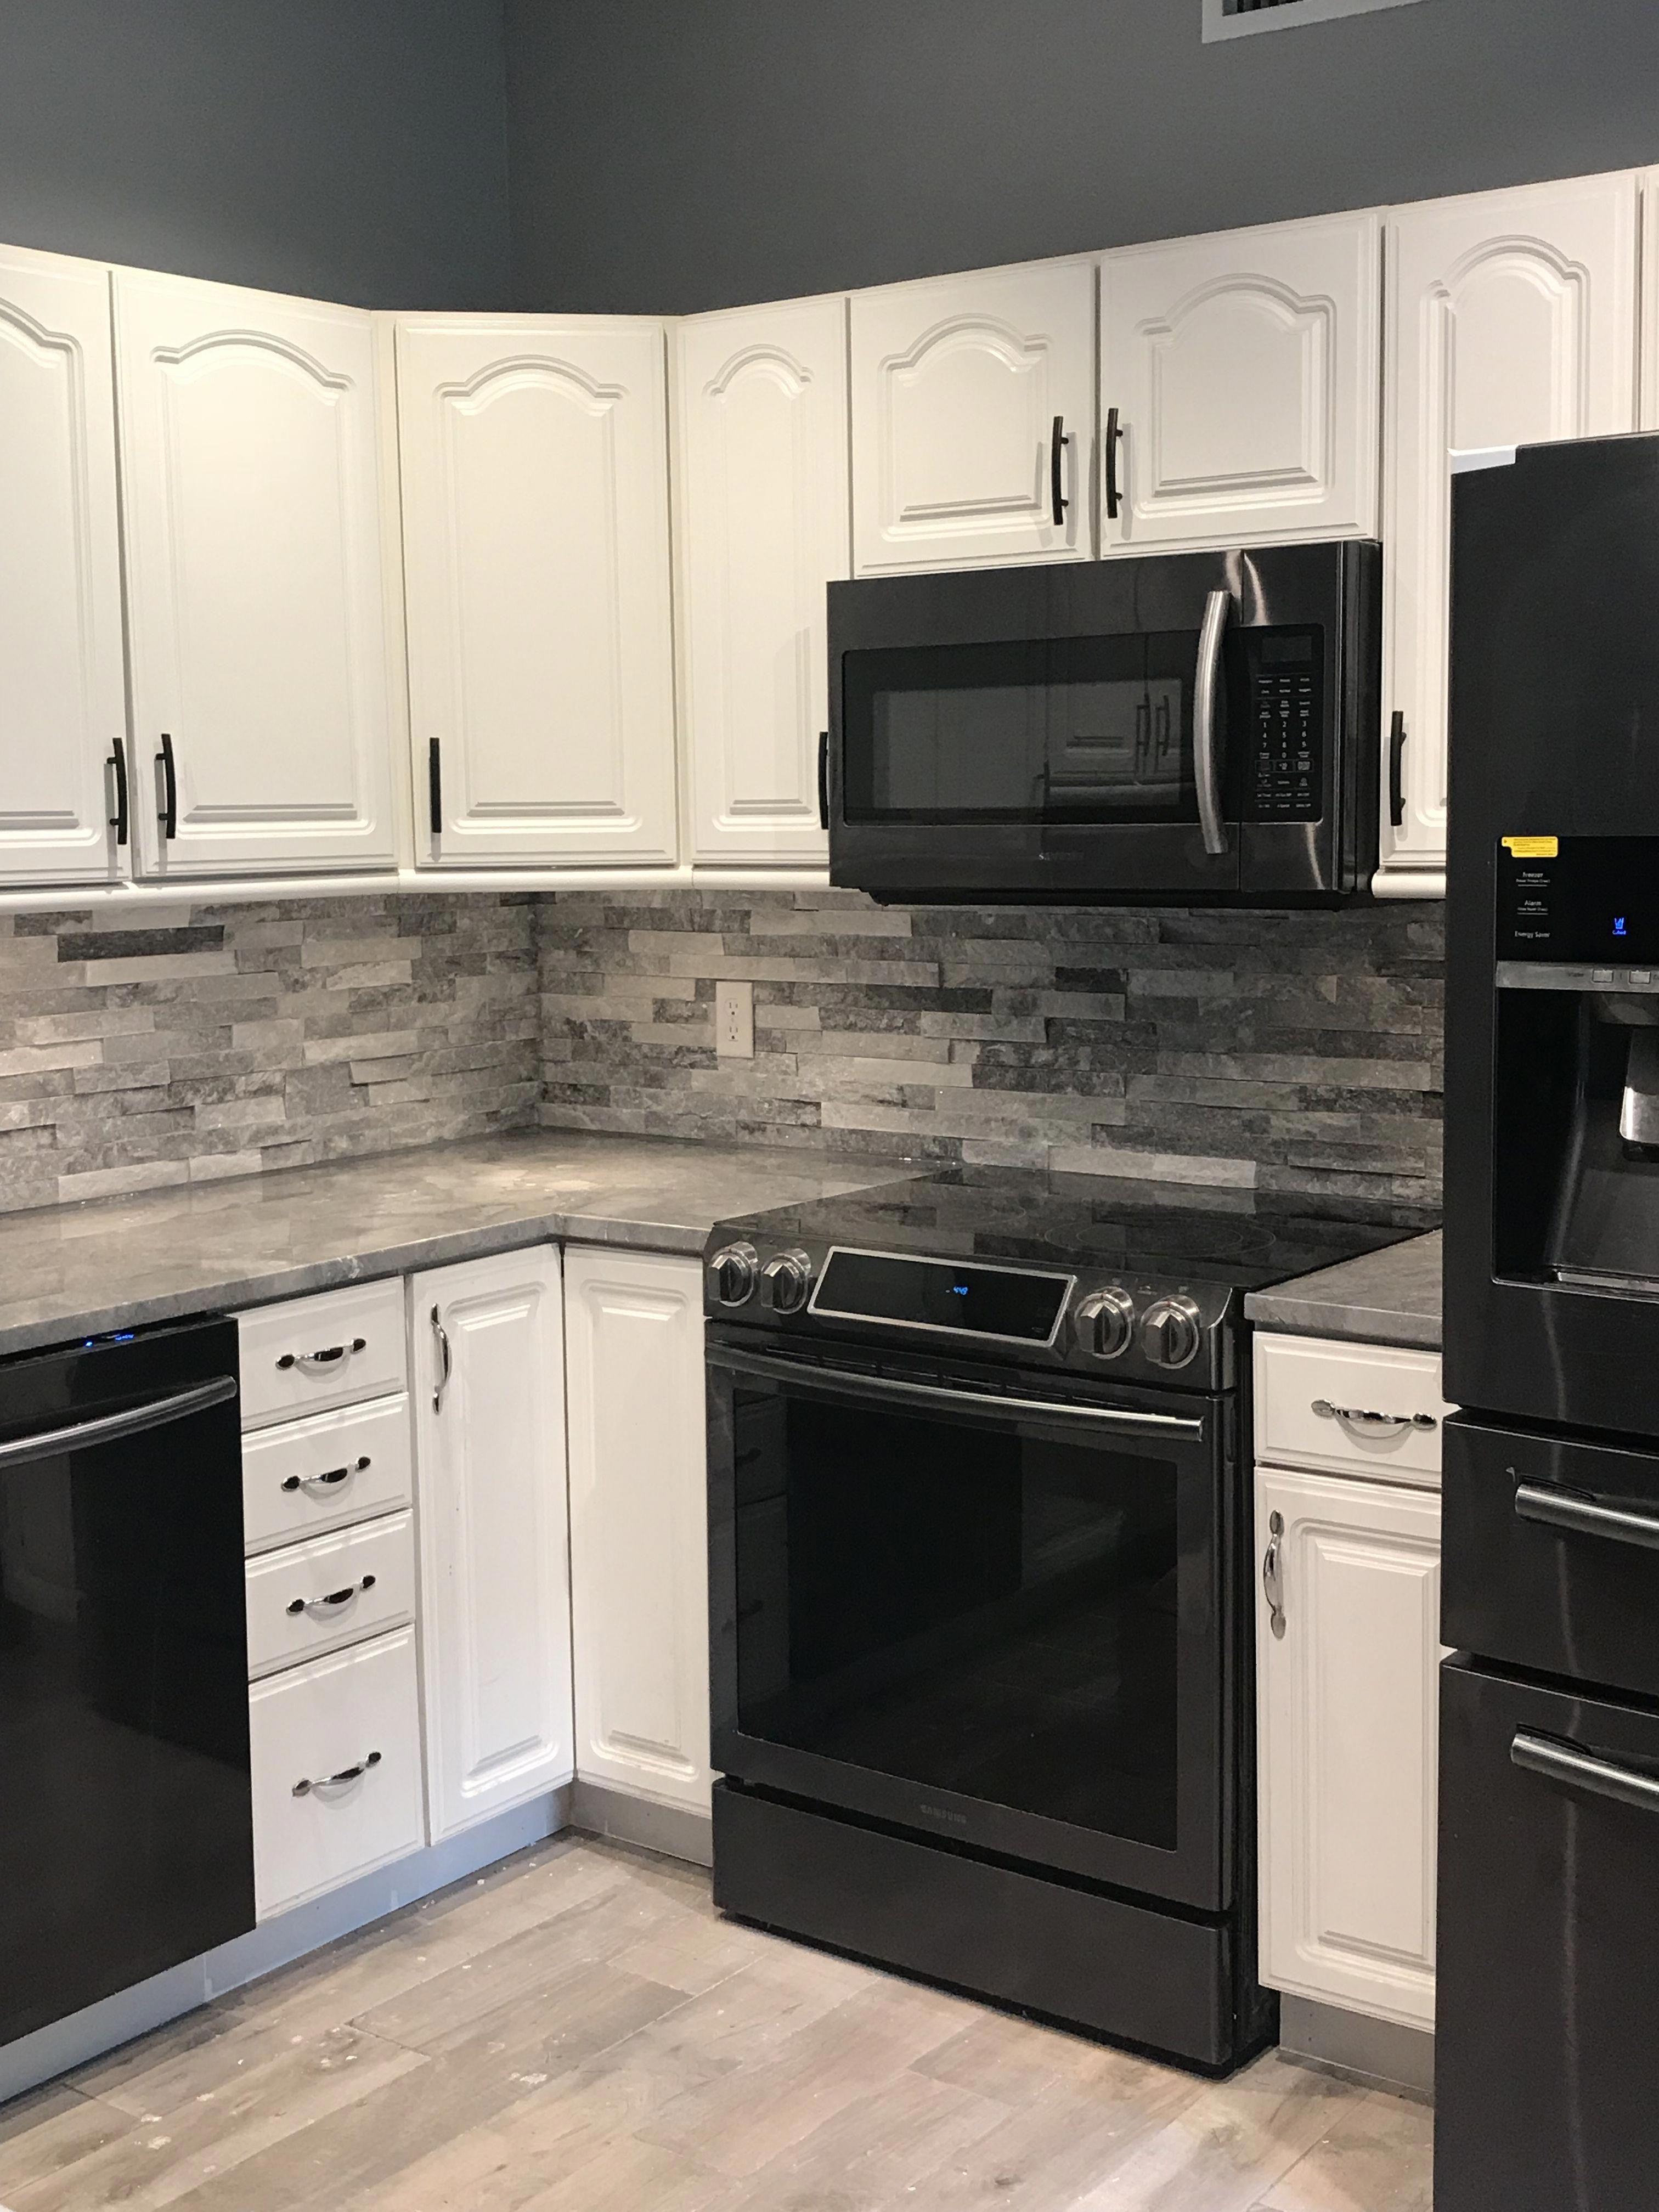 7 Diy Kitchen Countertop Ideas Concrete Countertops Kitchen